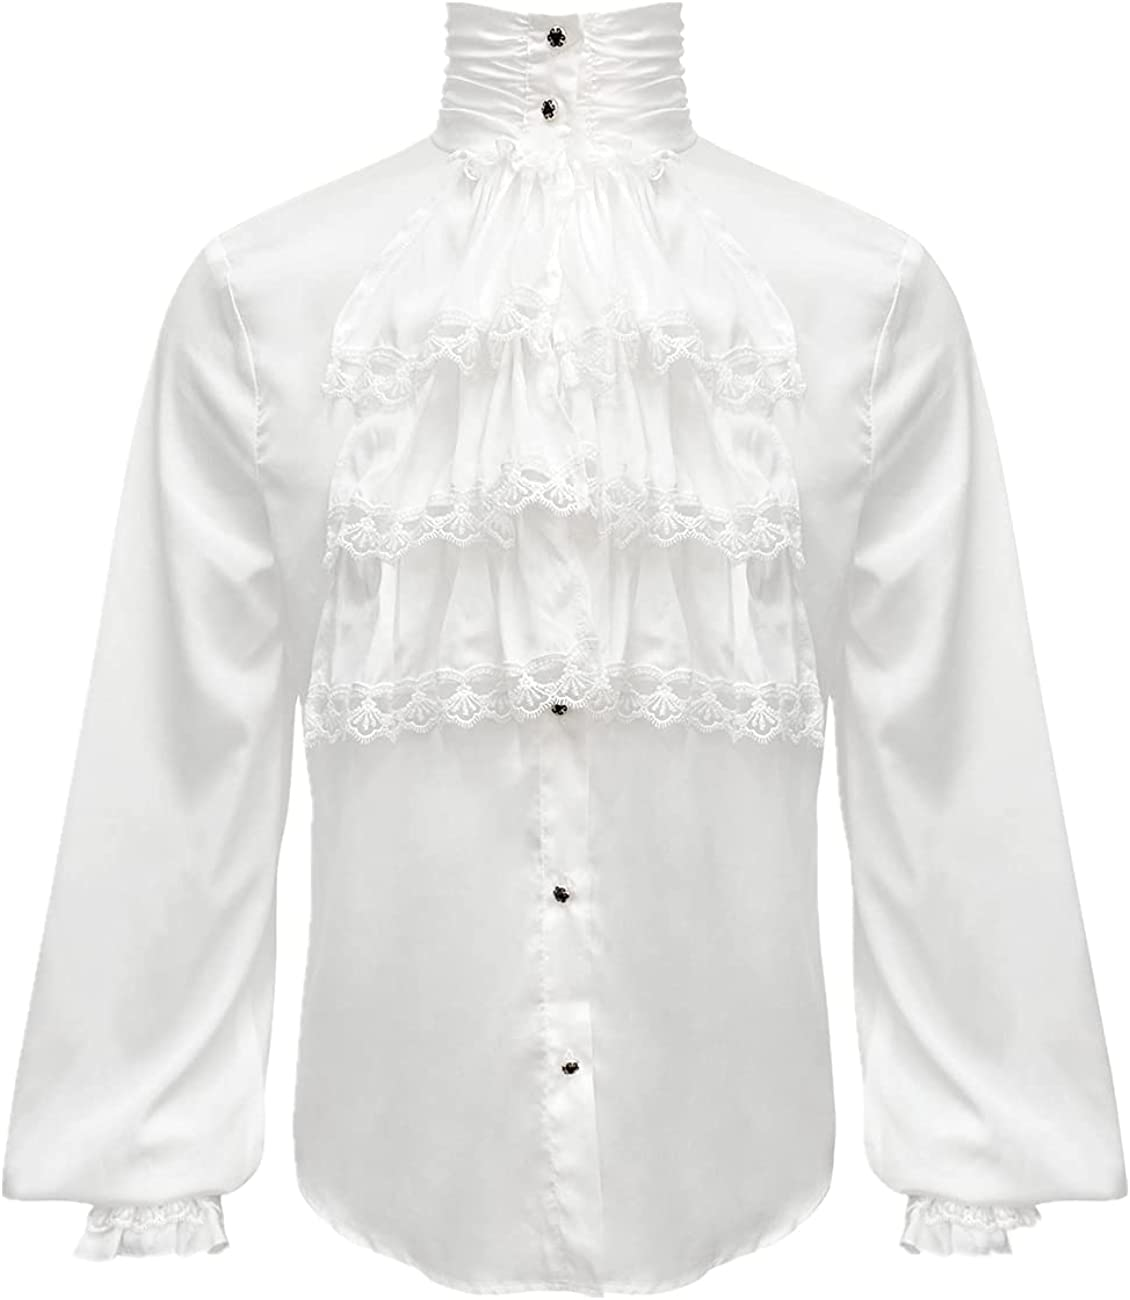 Apocrypha Mens Pirate Shirt Surprise price Victorian Tampa Mall Vampire Renaissance Mediev